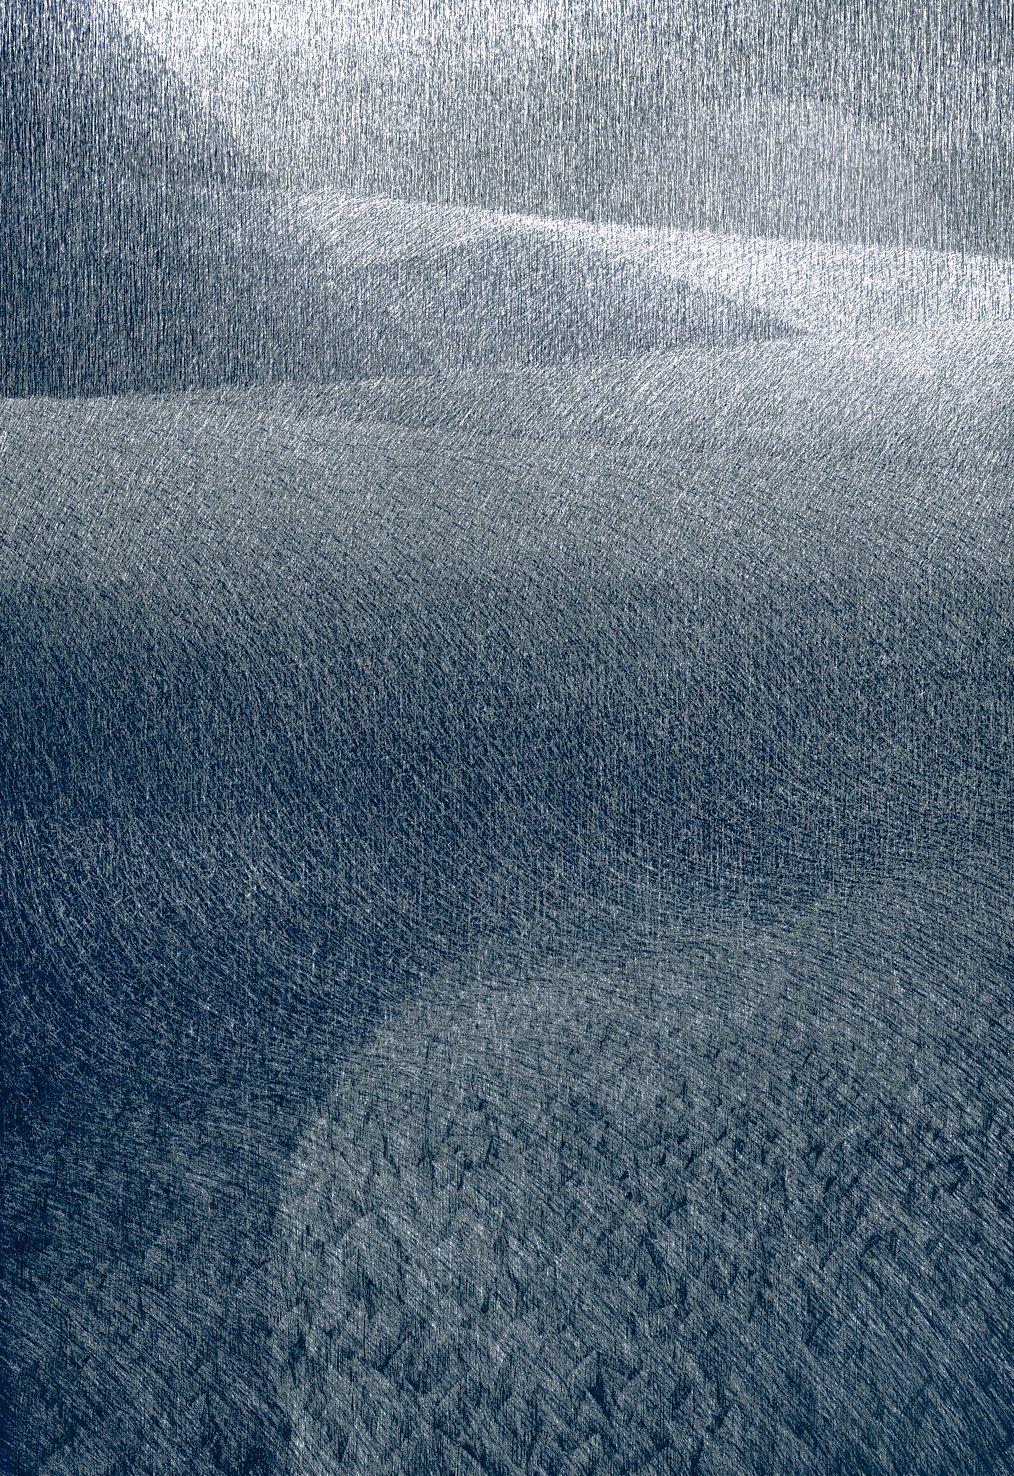 Landscape IV A